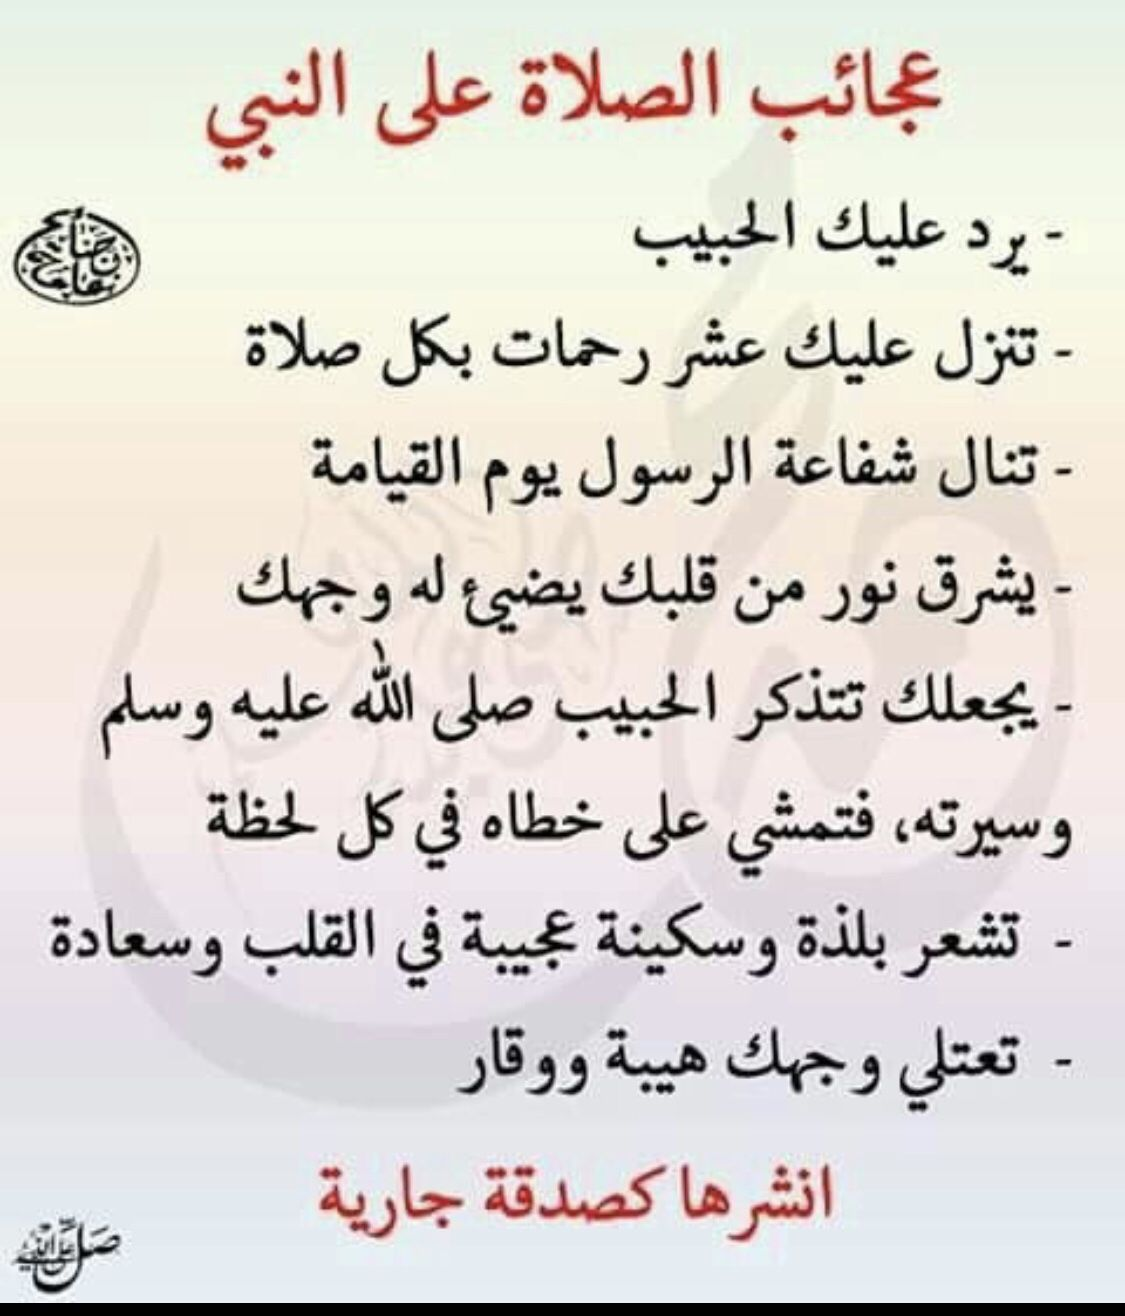 Pin By Rose Flower On كلمات قيمة Islamic Quotes Islamic Love Quotes Islamic Phrases